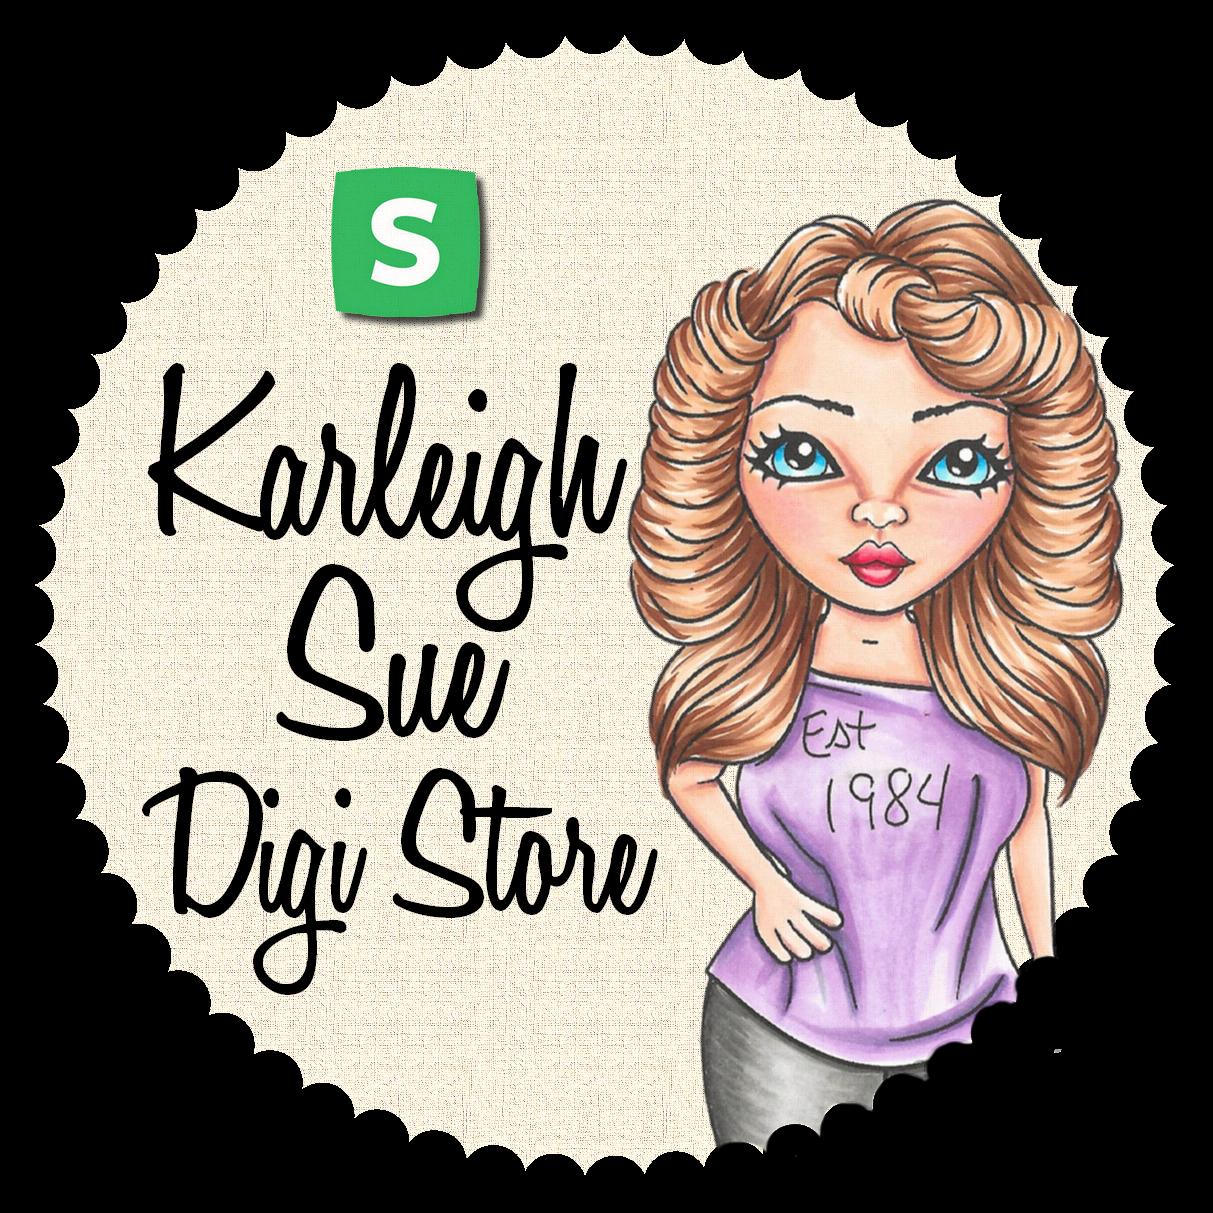 Karleigh Sue Digi's